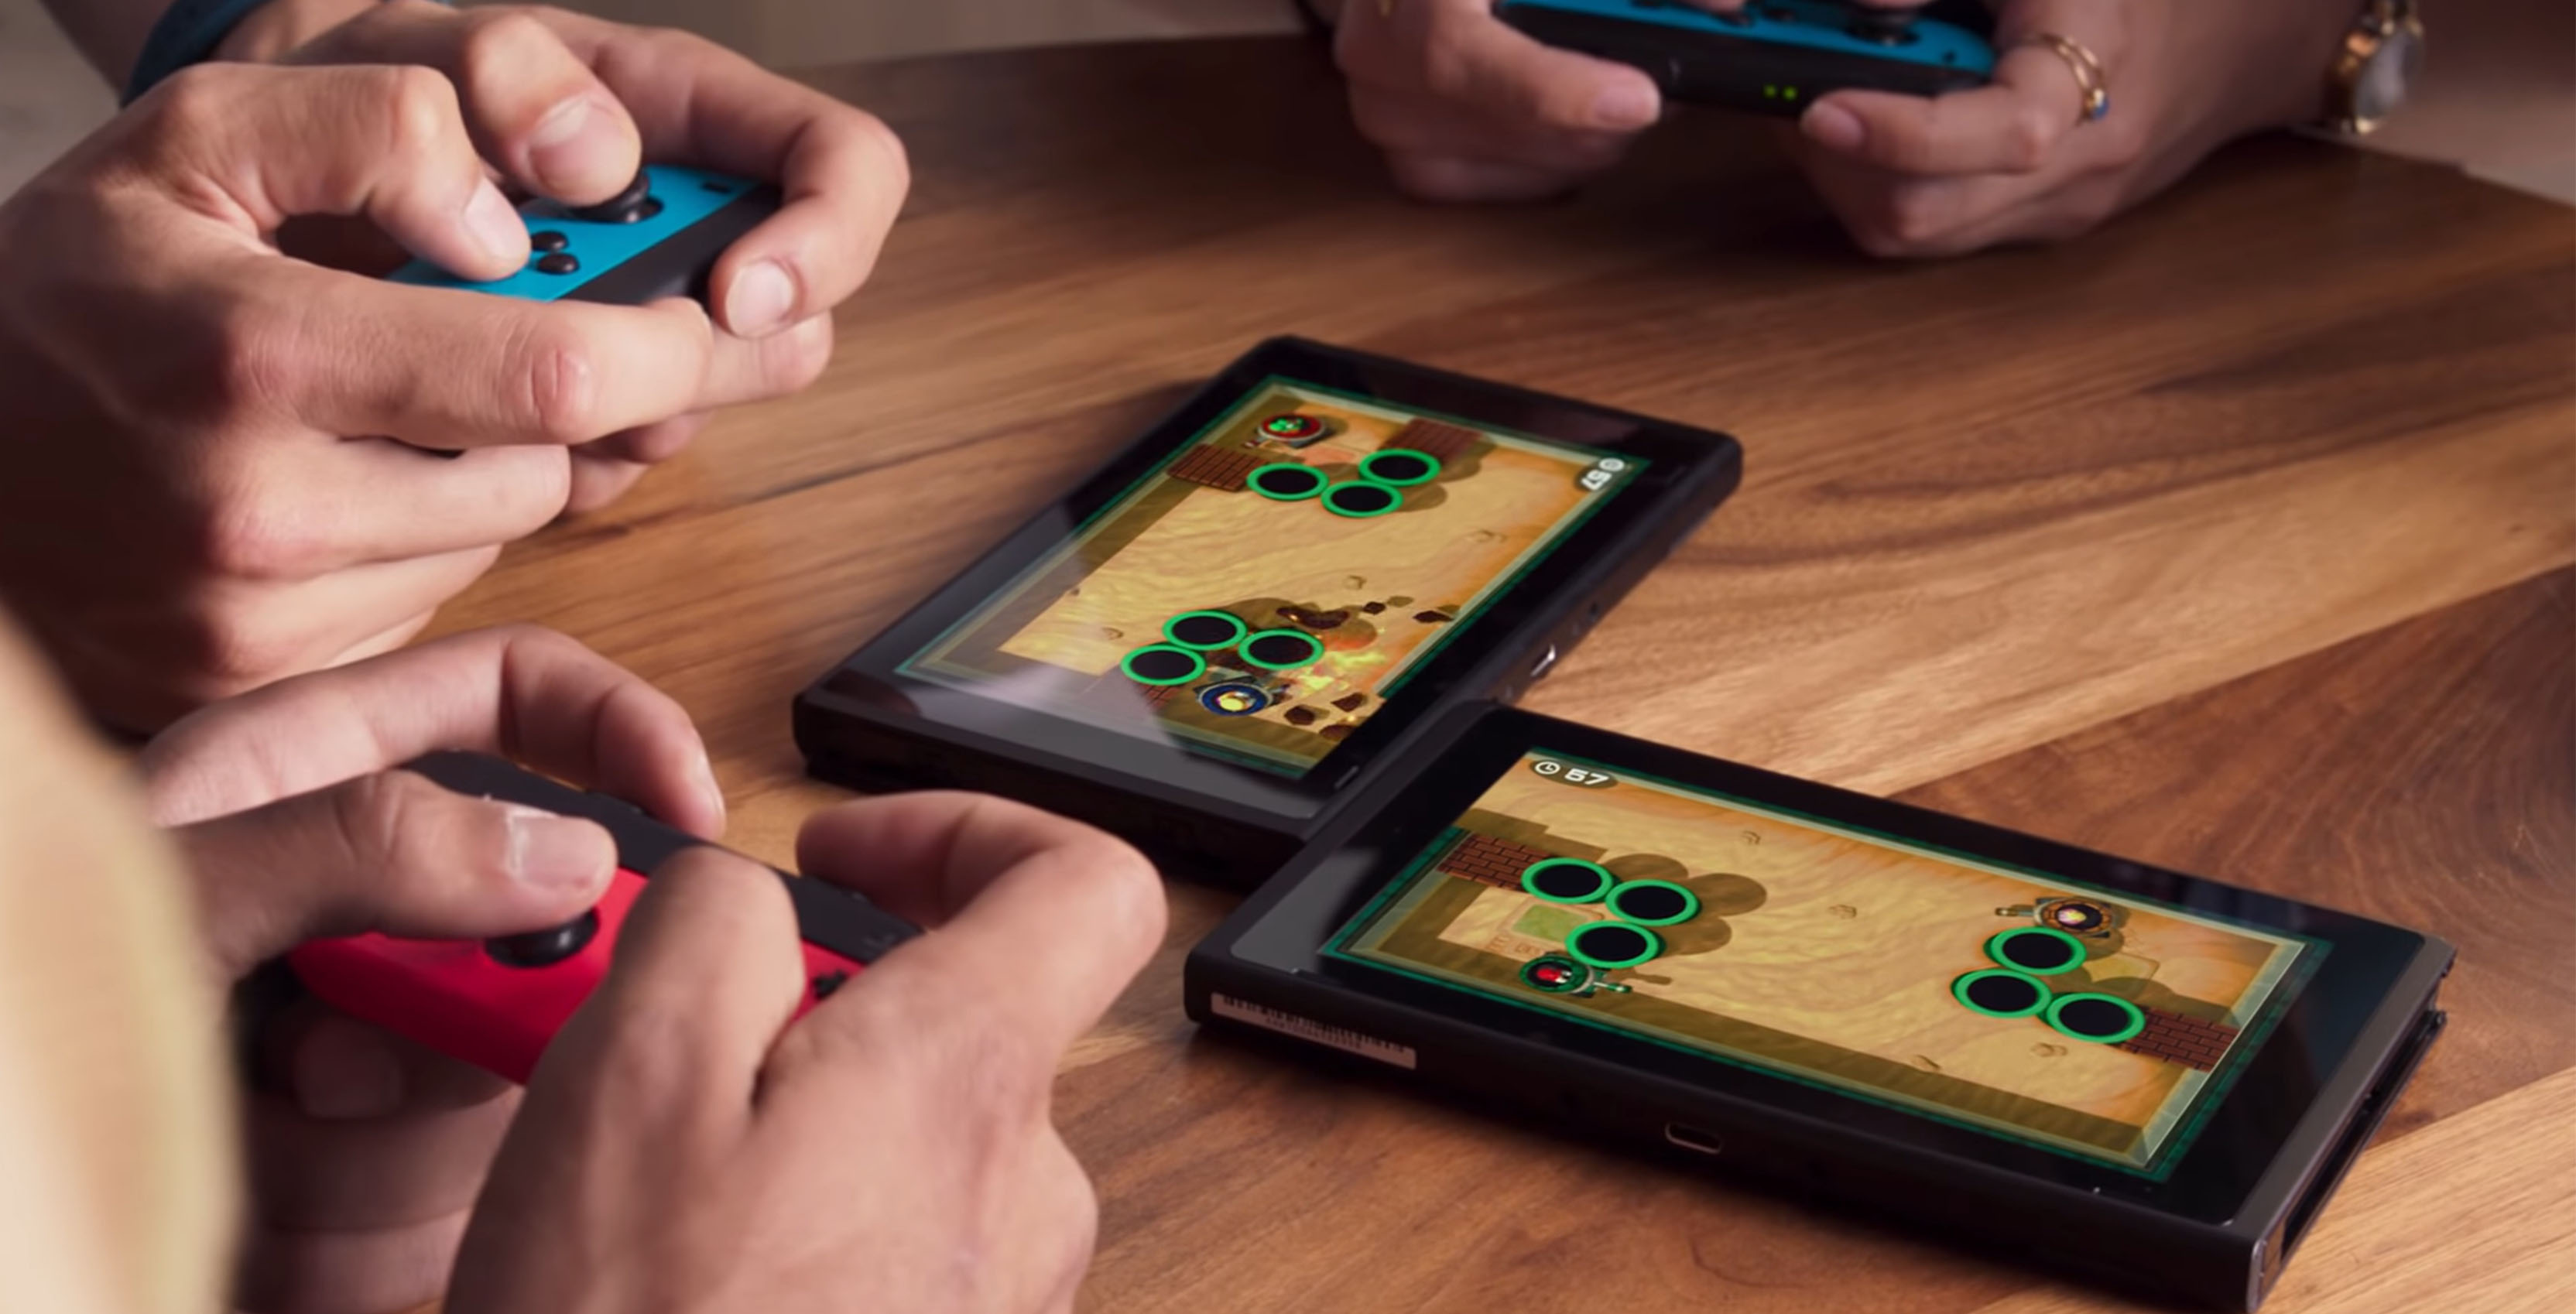 Super Mario Part on Nintendo Switch